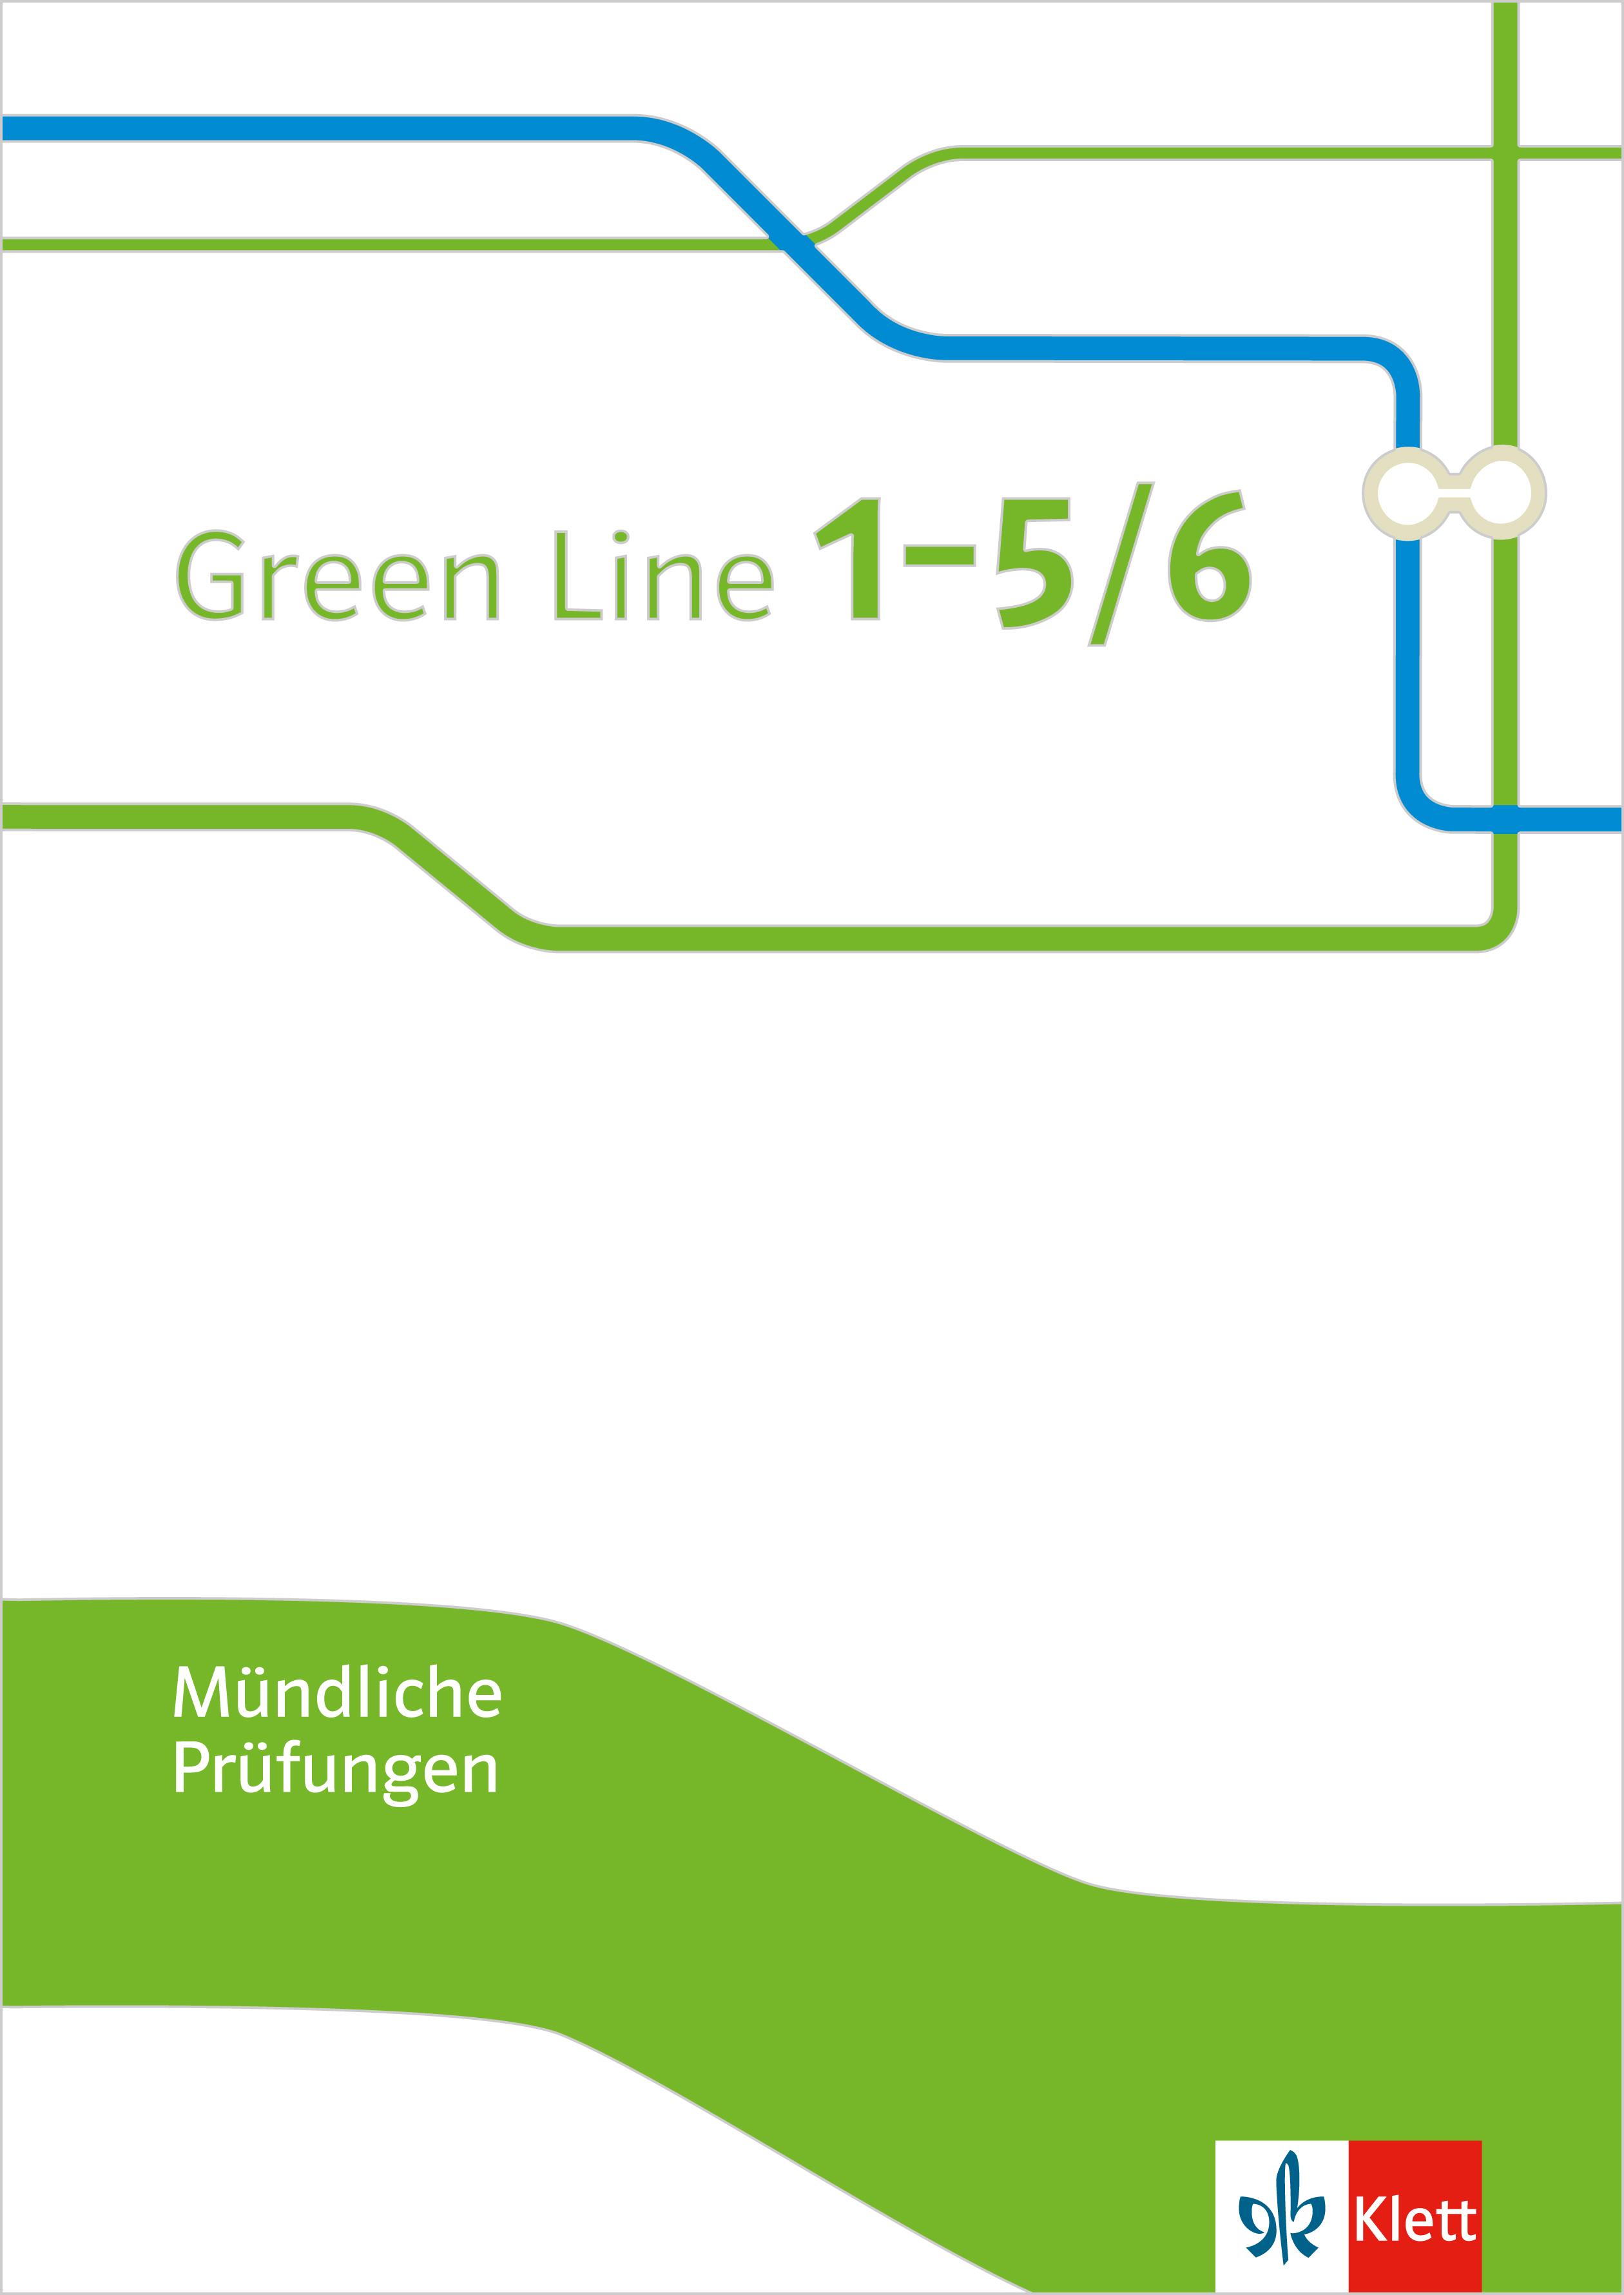 Green Line 1-5/6